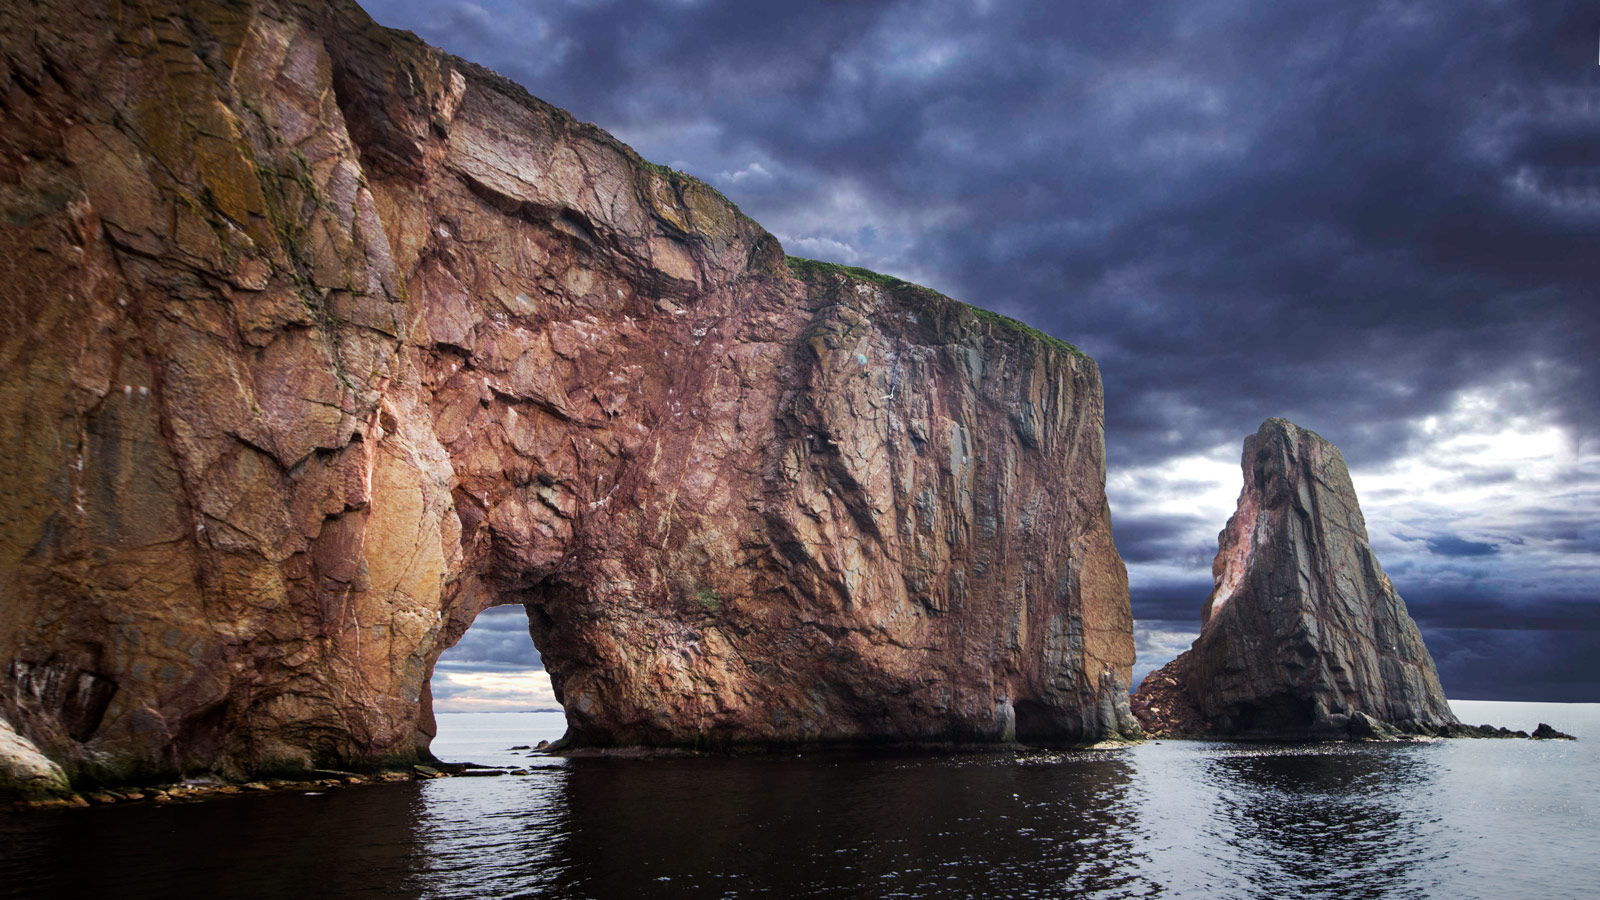 8b72fdb0690 Why You Need to Visit Bonaventure Island and Perce Rock - Adventure Family  Travel - Wandering Wagars